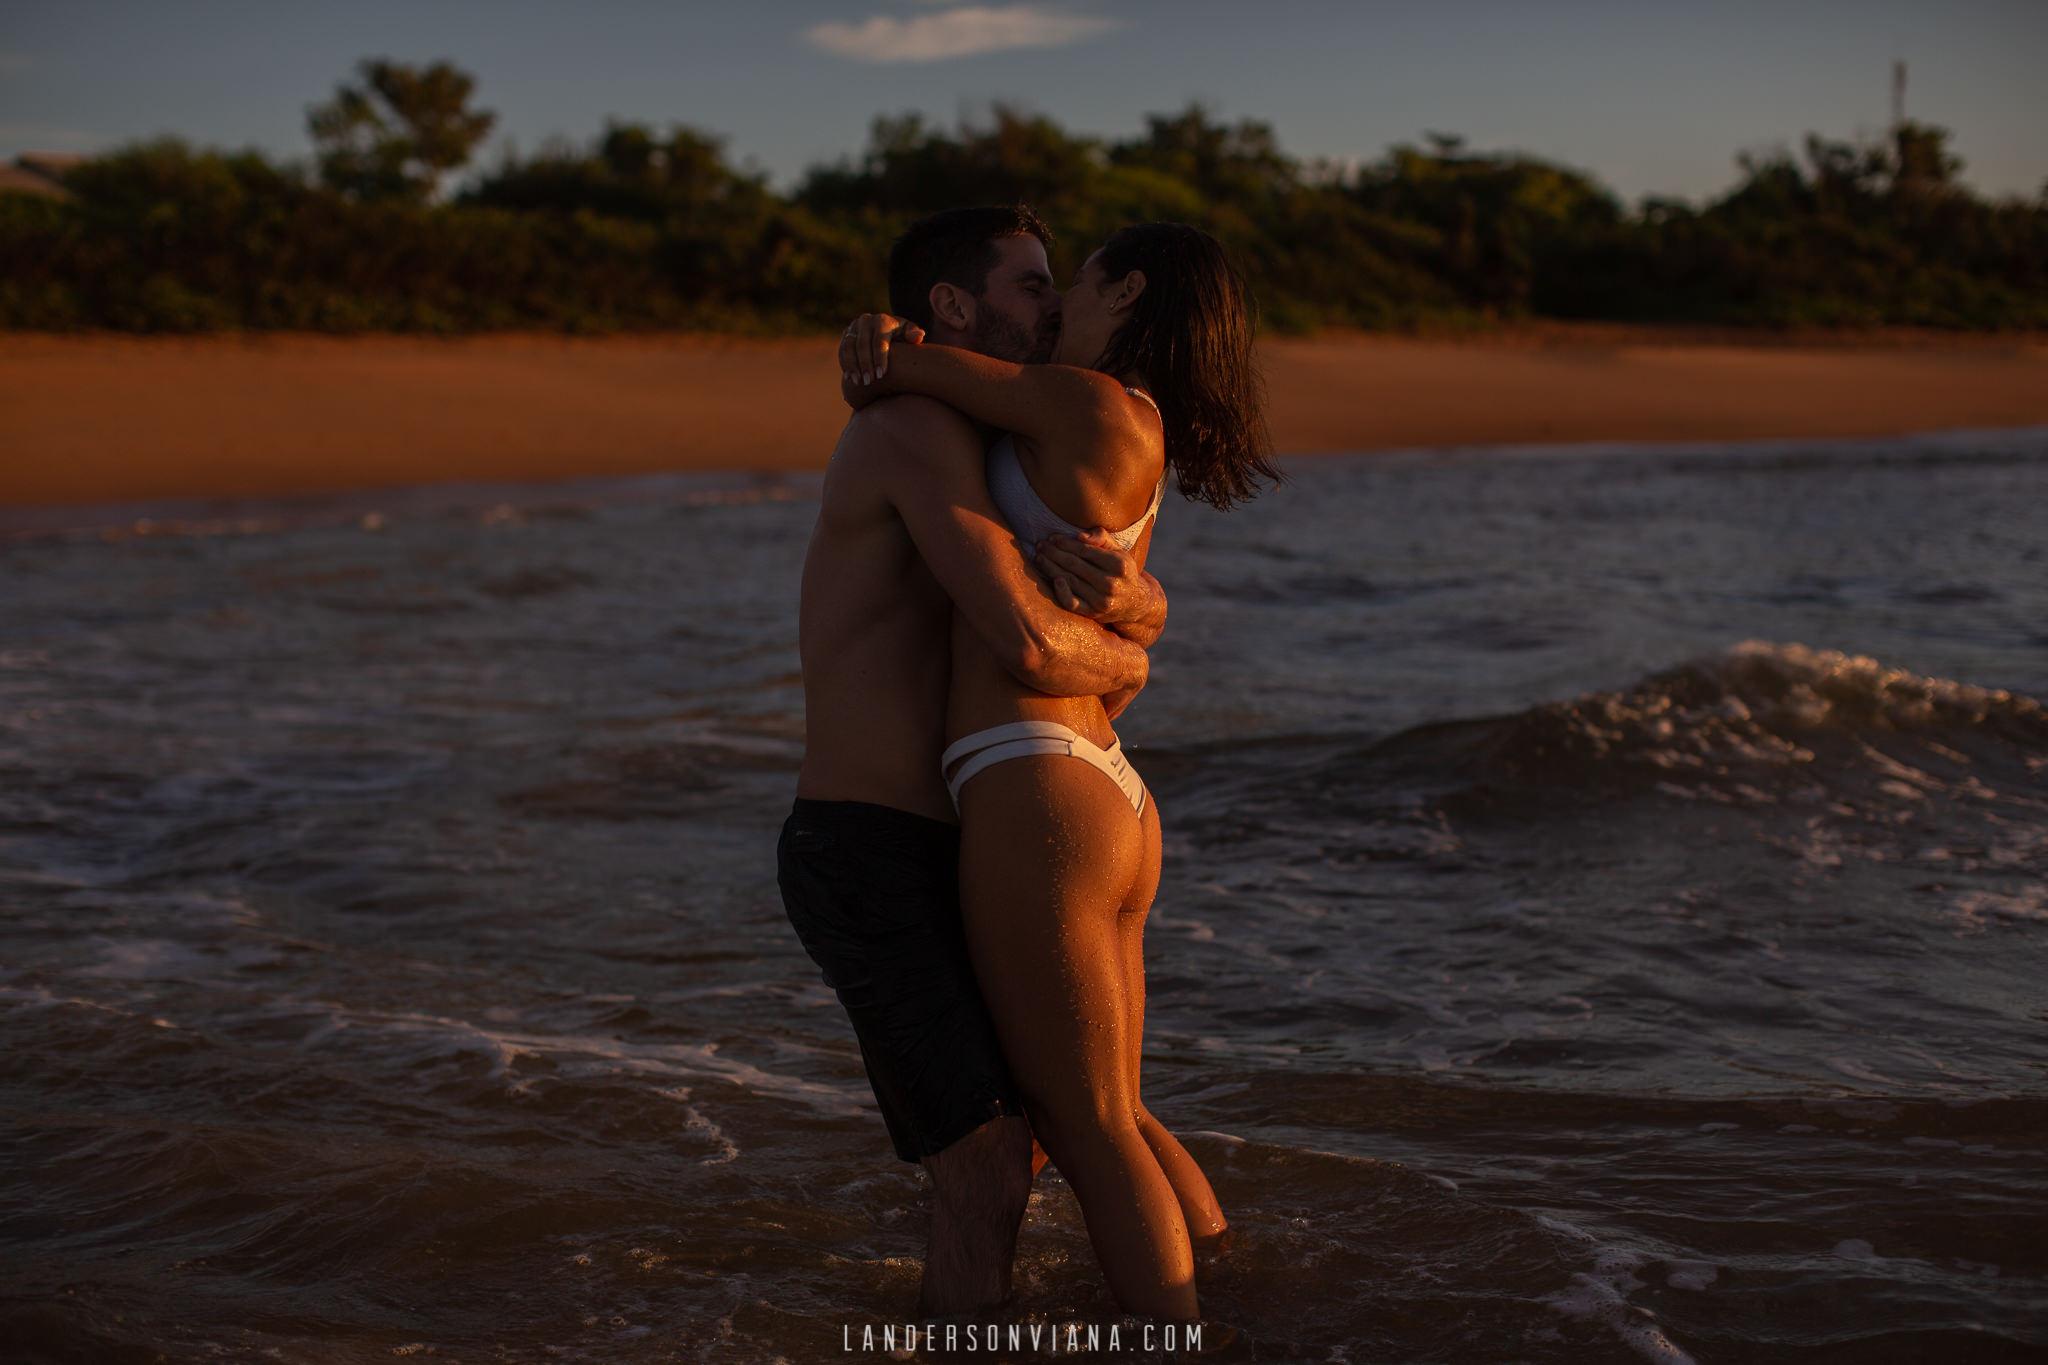 ensaio-pre-wedding-praia-landerson-viana-fotografia-casamento-pegueiobouquet-76.jpg